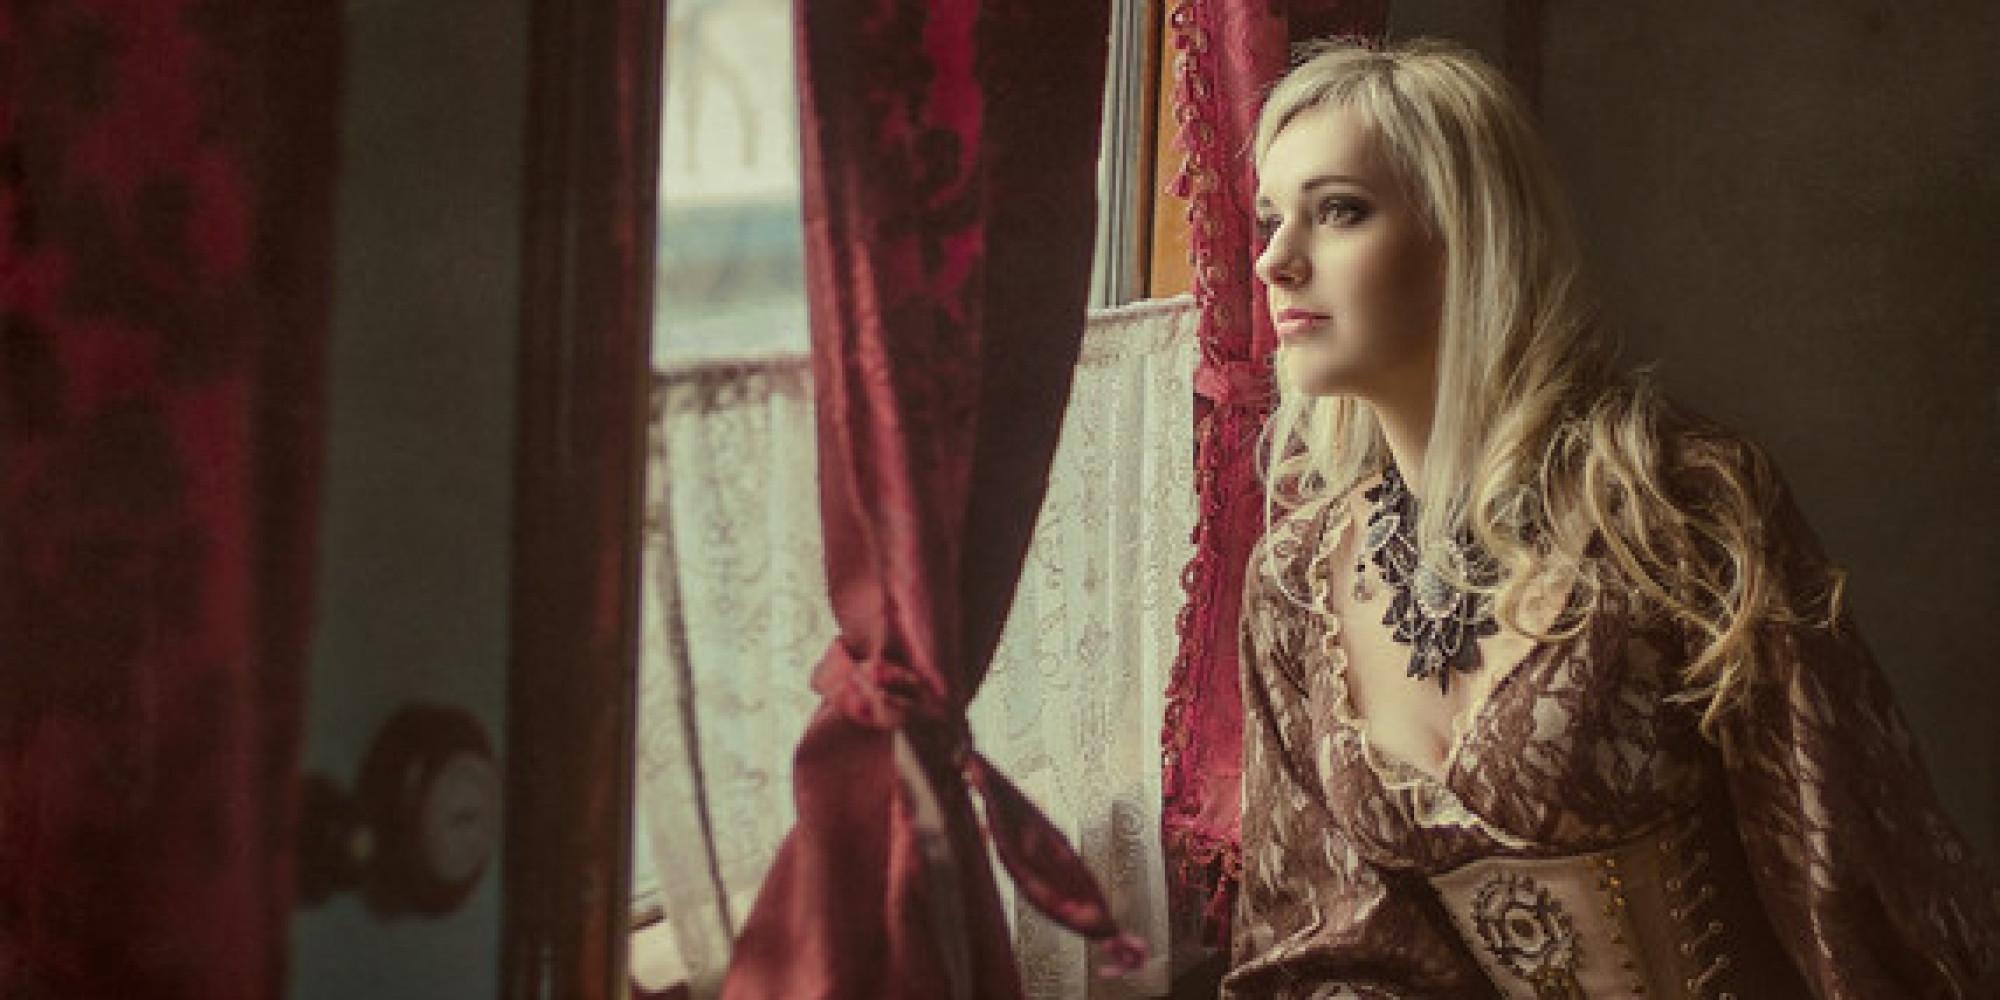 The Sexy and Surreal Portraits of Galiya Zhelnova (NSFW